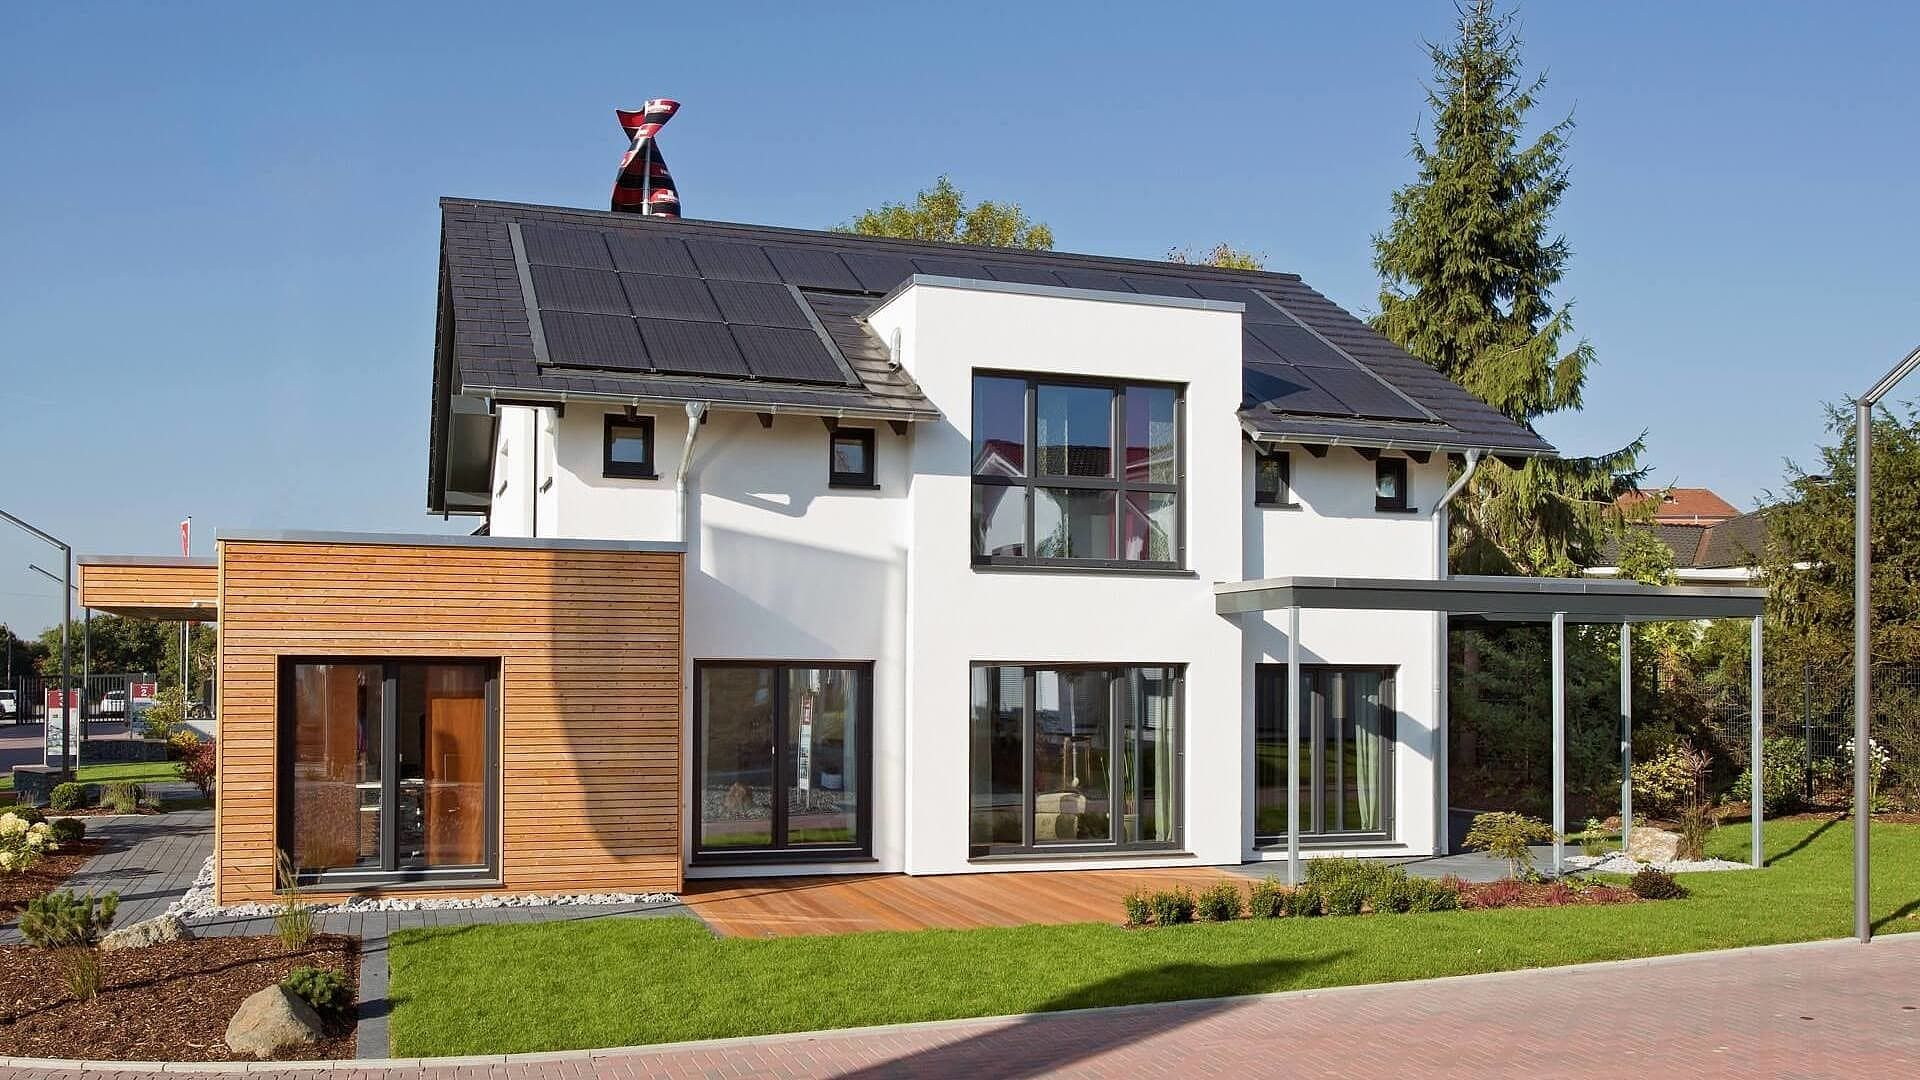 musterhaus wuppertal haustypen pinterest herzlich willkommen energie und sparen. Black Bedroom Furniture Sets. Home Design Ideas